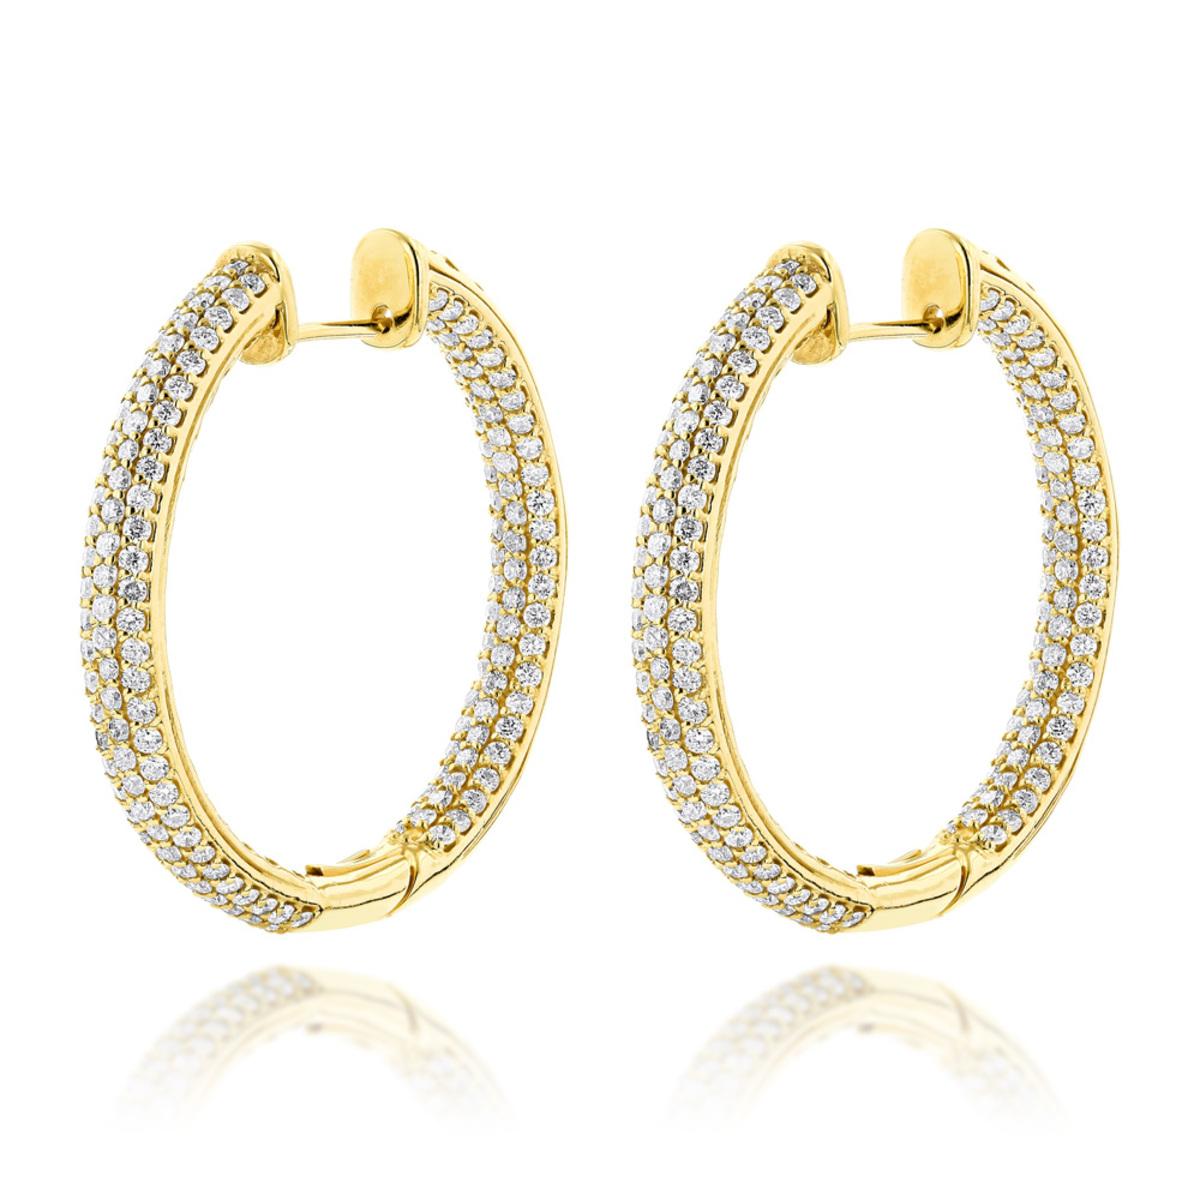 14K Gold Large Inside Out Diamond Hoop Earrings 6ct